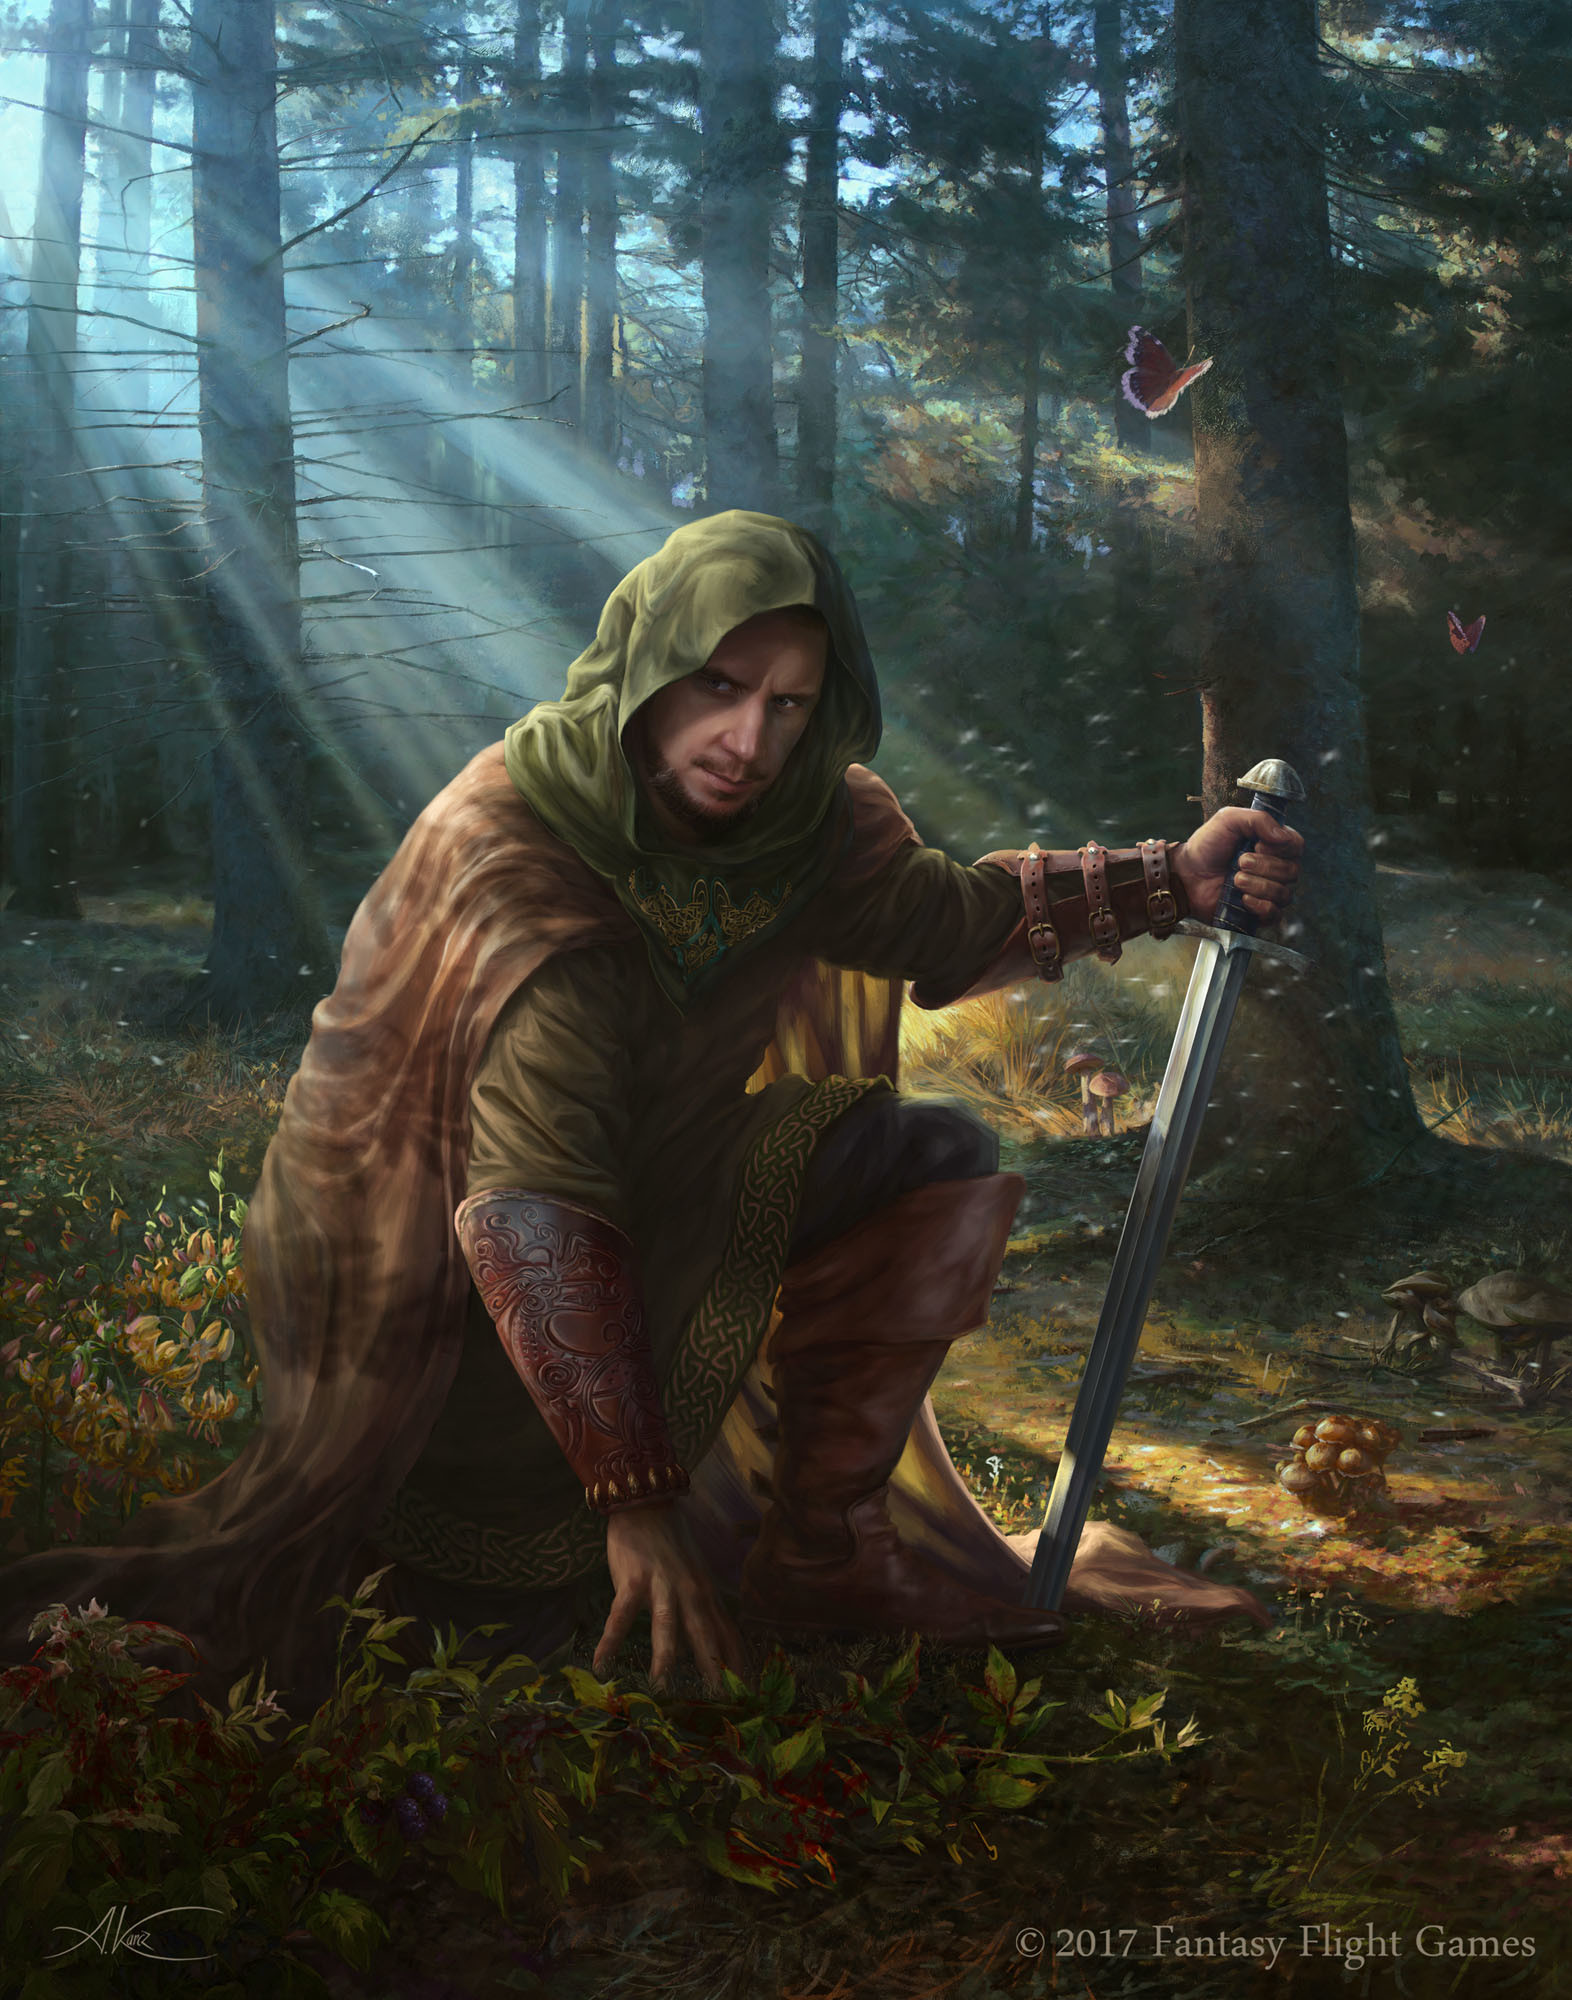 Wallpaper Hd Lord Of The Rings Artstation Dunedain Tracker Aleksander Karcz